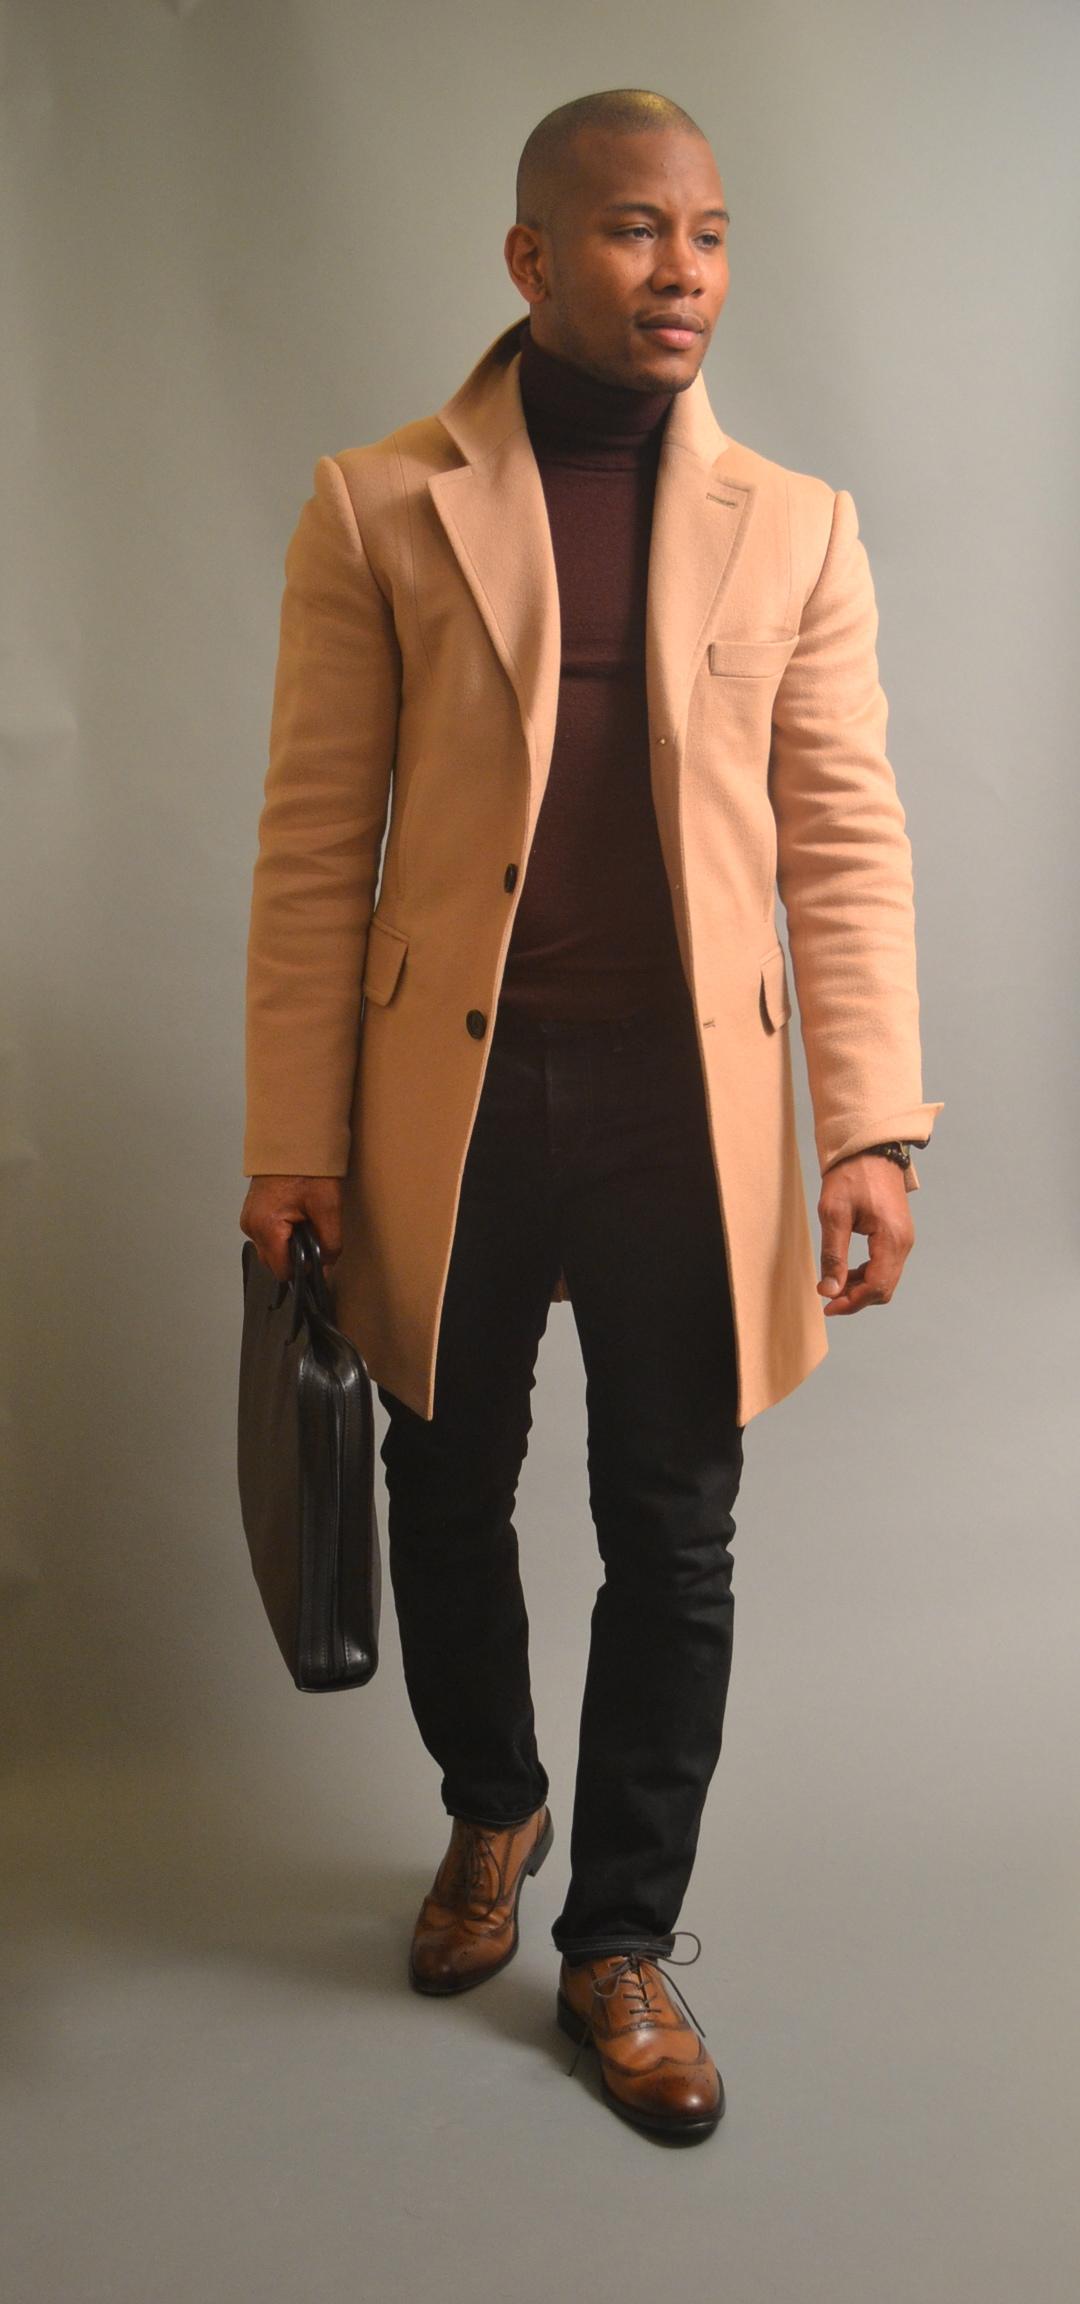 Sabir Peele In 3x1 black denim jeans & aston grey wingtips from dsw